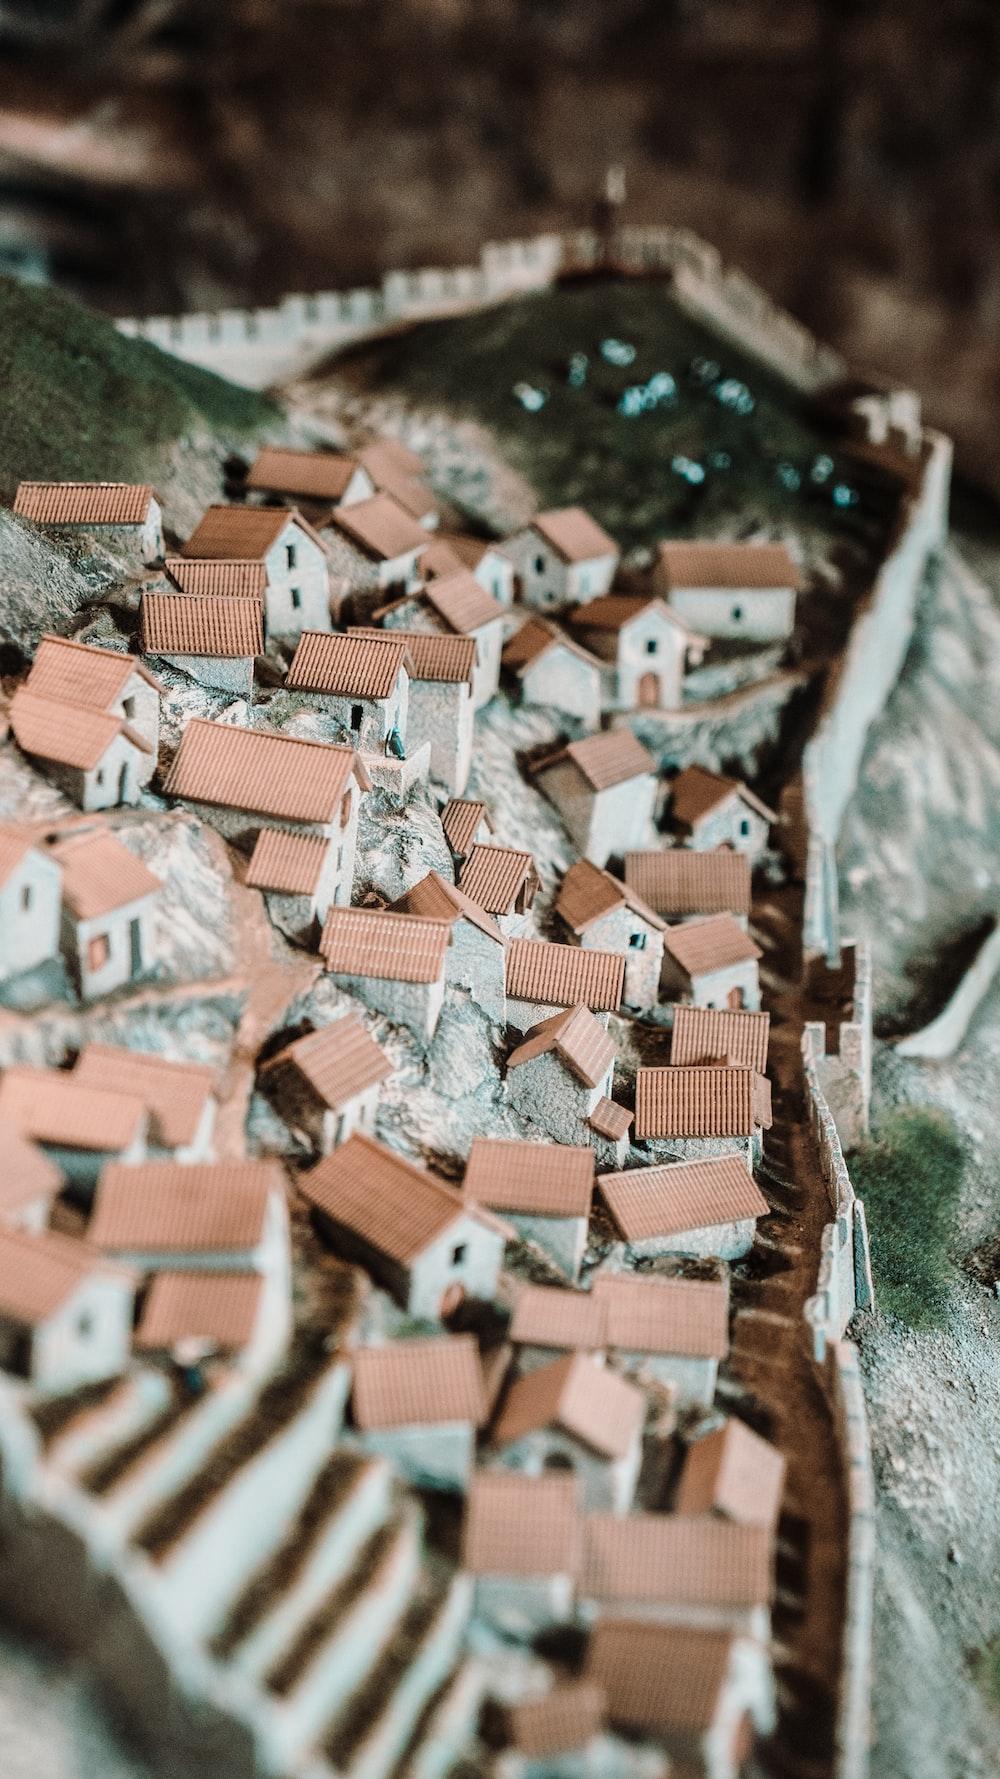 tilt shift photography of miniature house